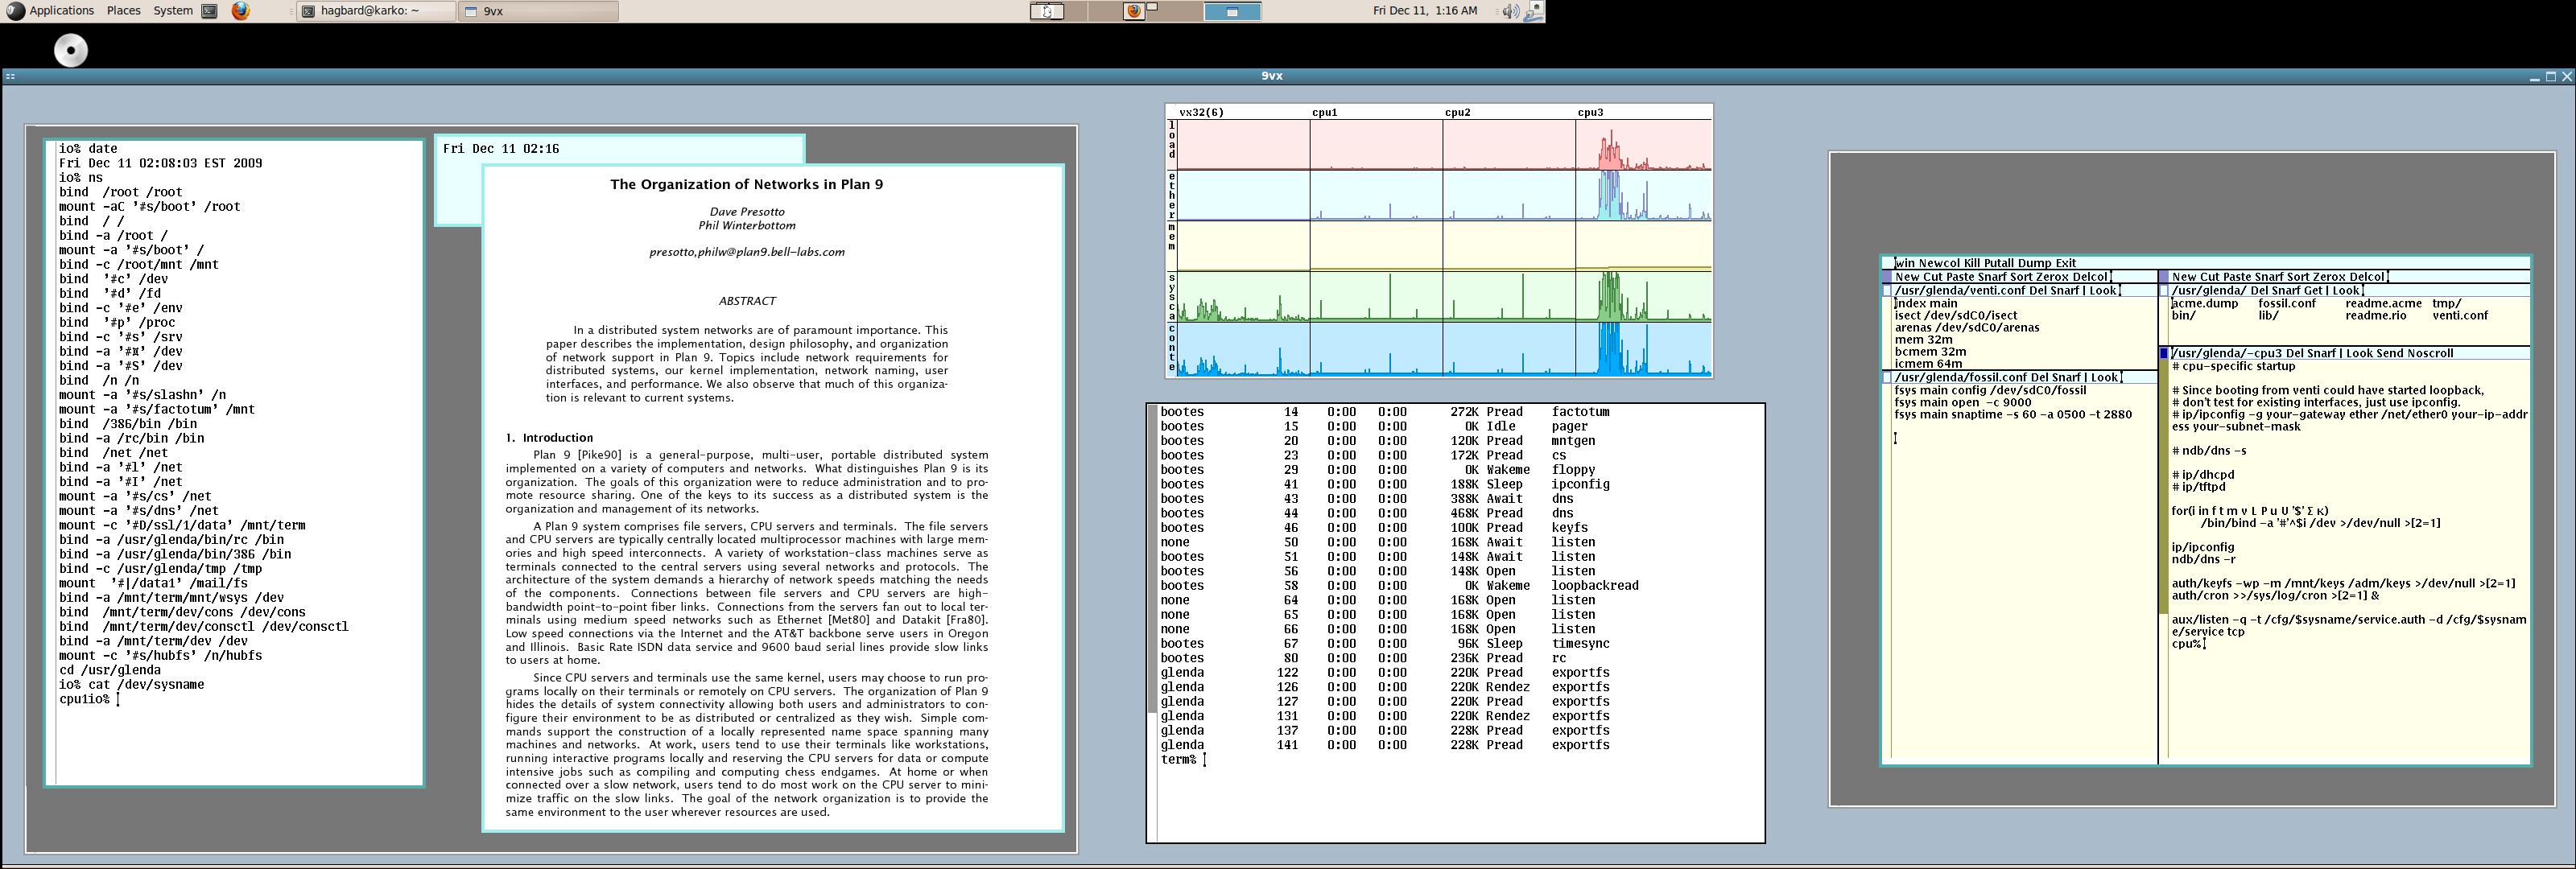 Gridscriptsinaction Png  0218 66k Gridtools Tgz  2328 128m Gridtoolsplus Tgz  0437 131m Gscripts1  Jan 2009